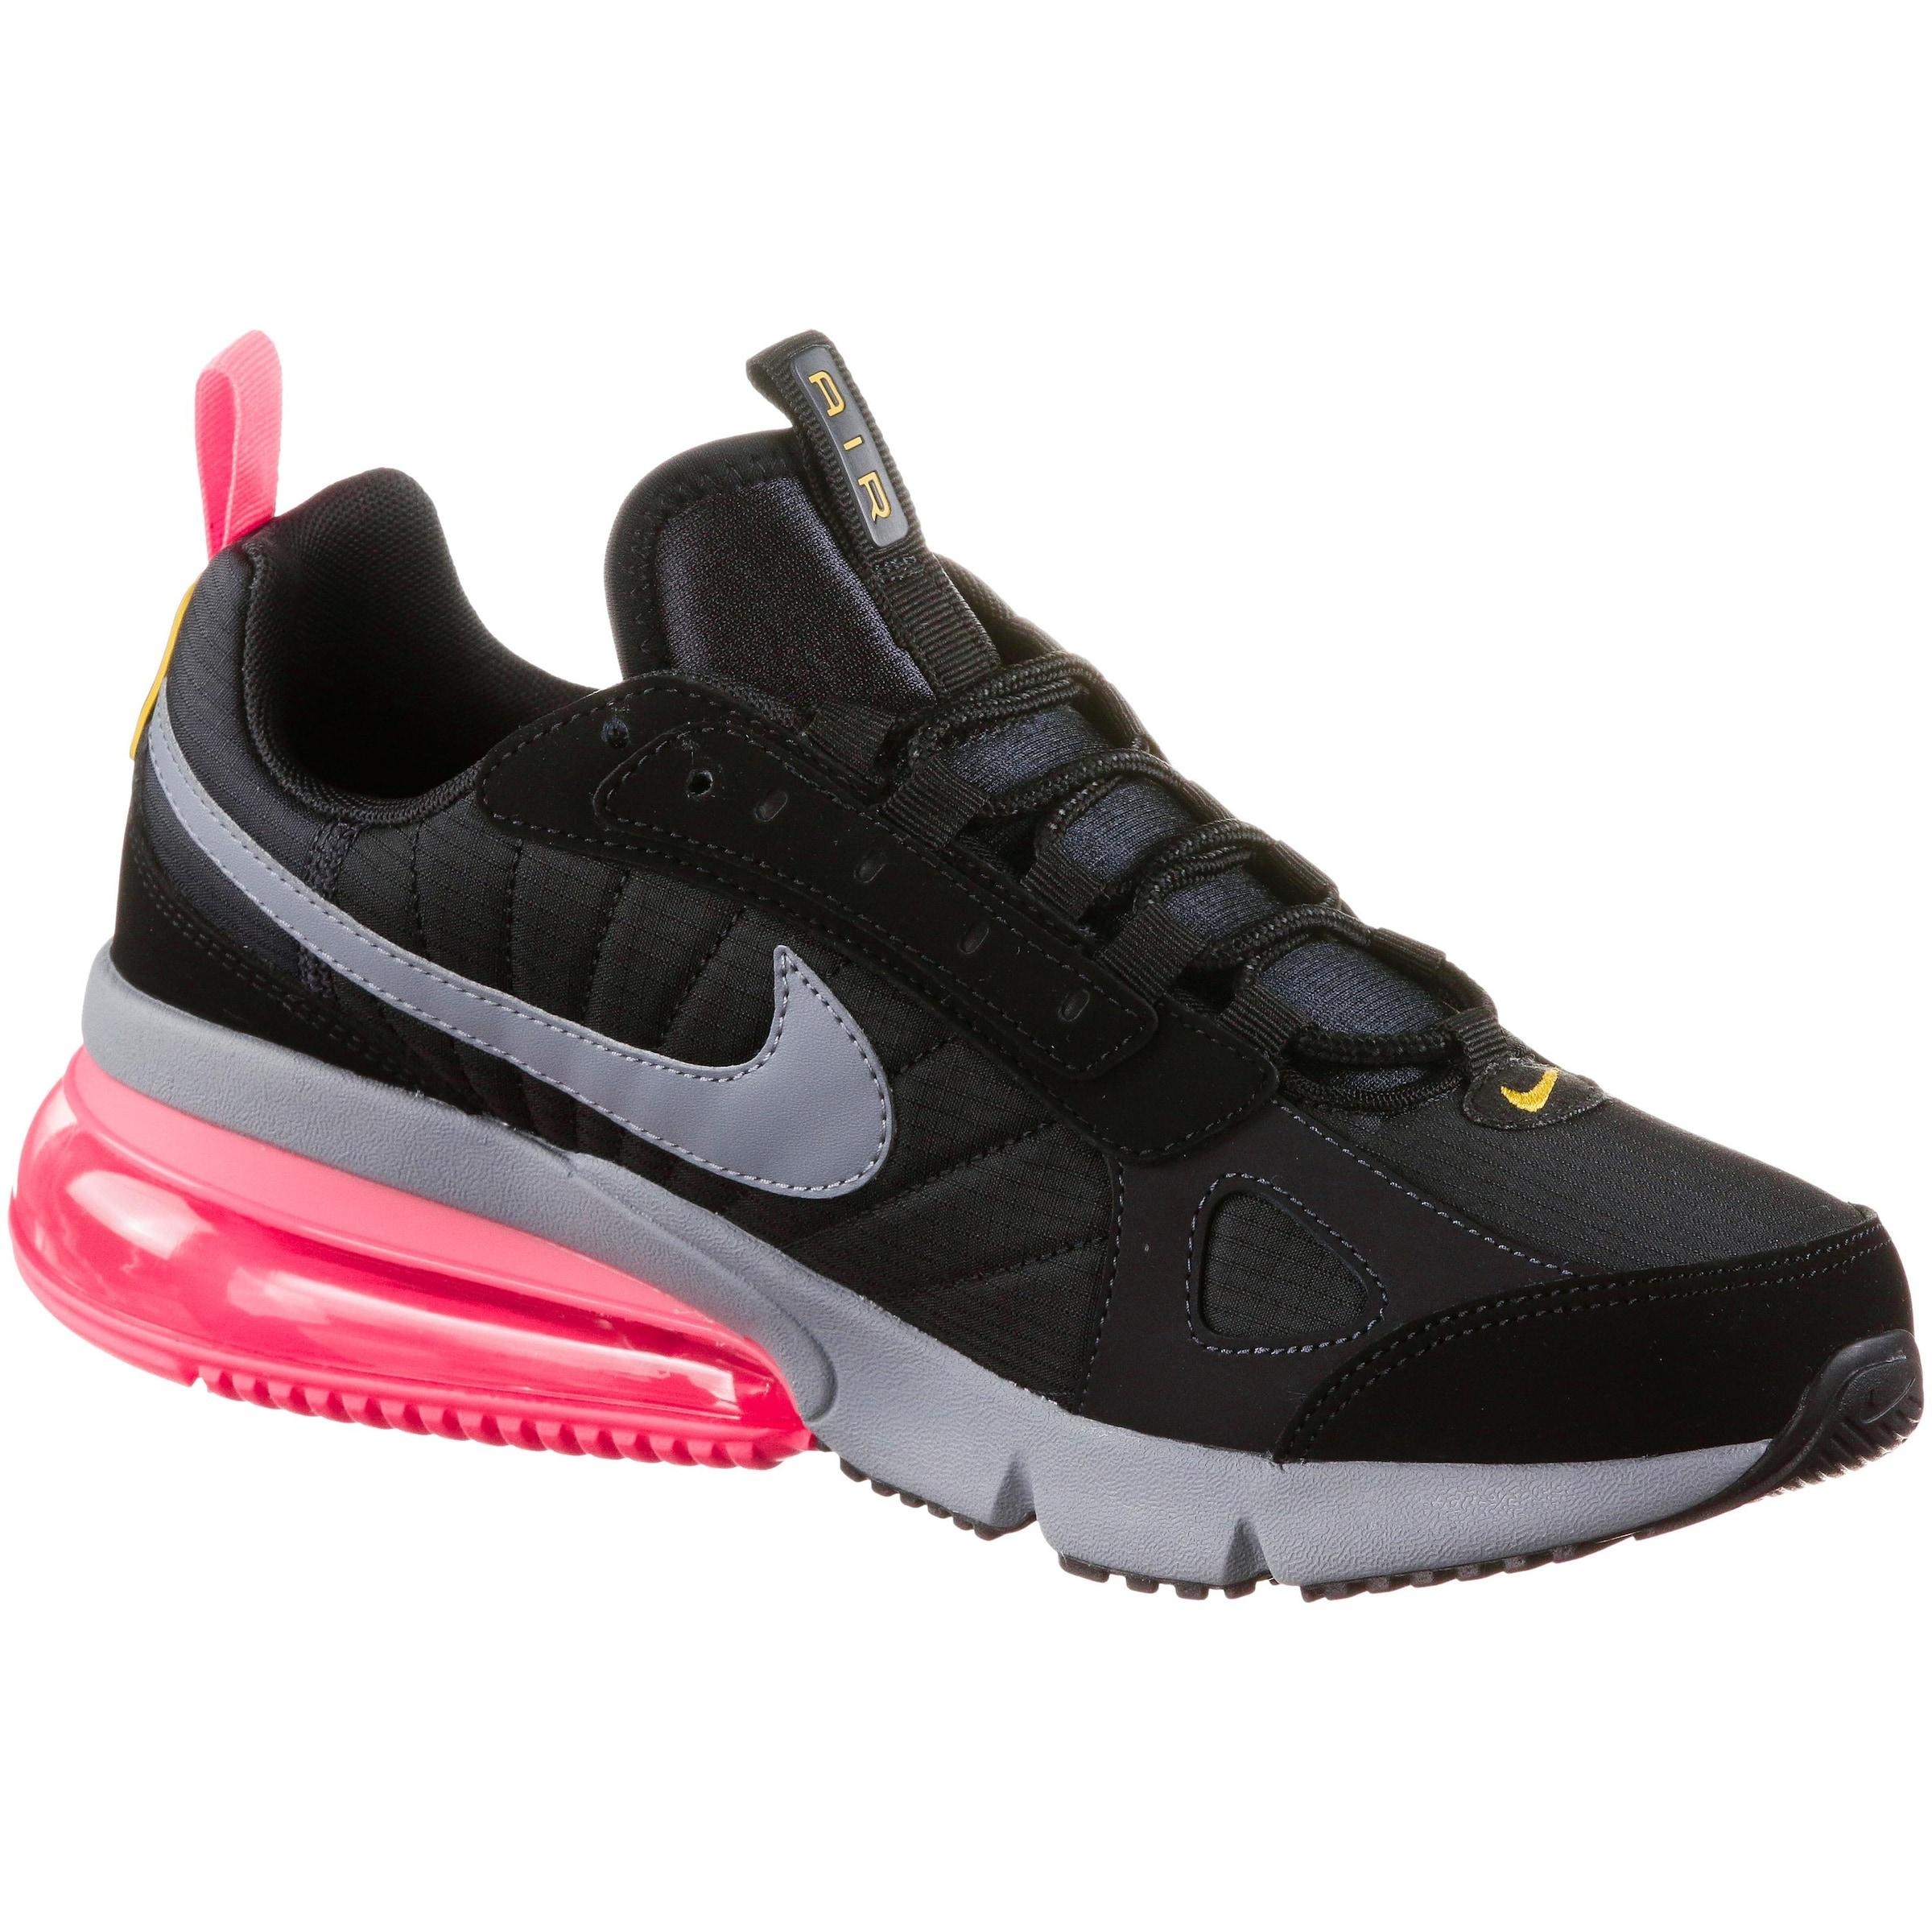 Max In Futura' Schwarz 270 GrauGrenadine Sportswear 'air Nike Sneaker PZlwXuTOki